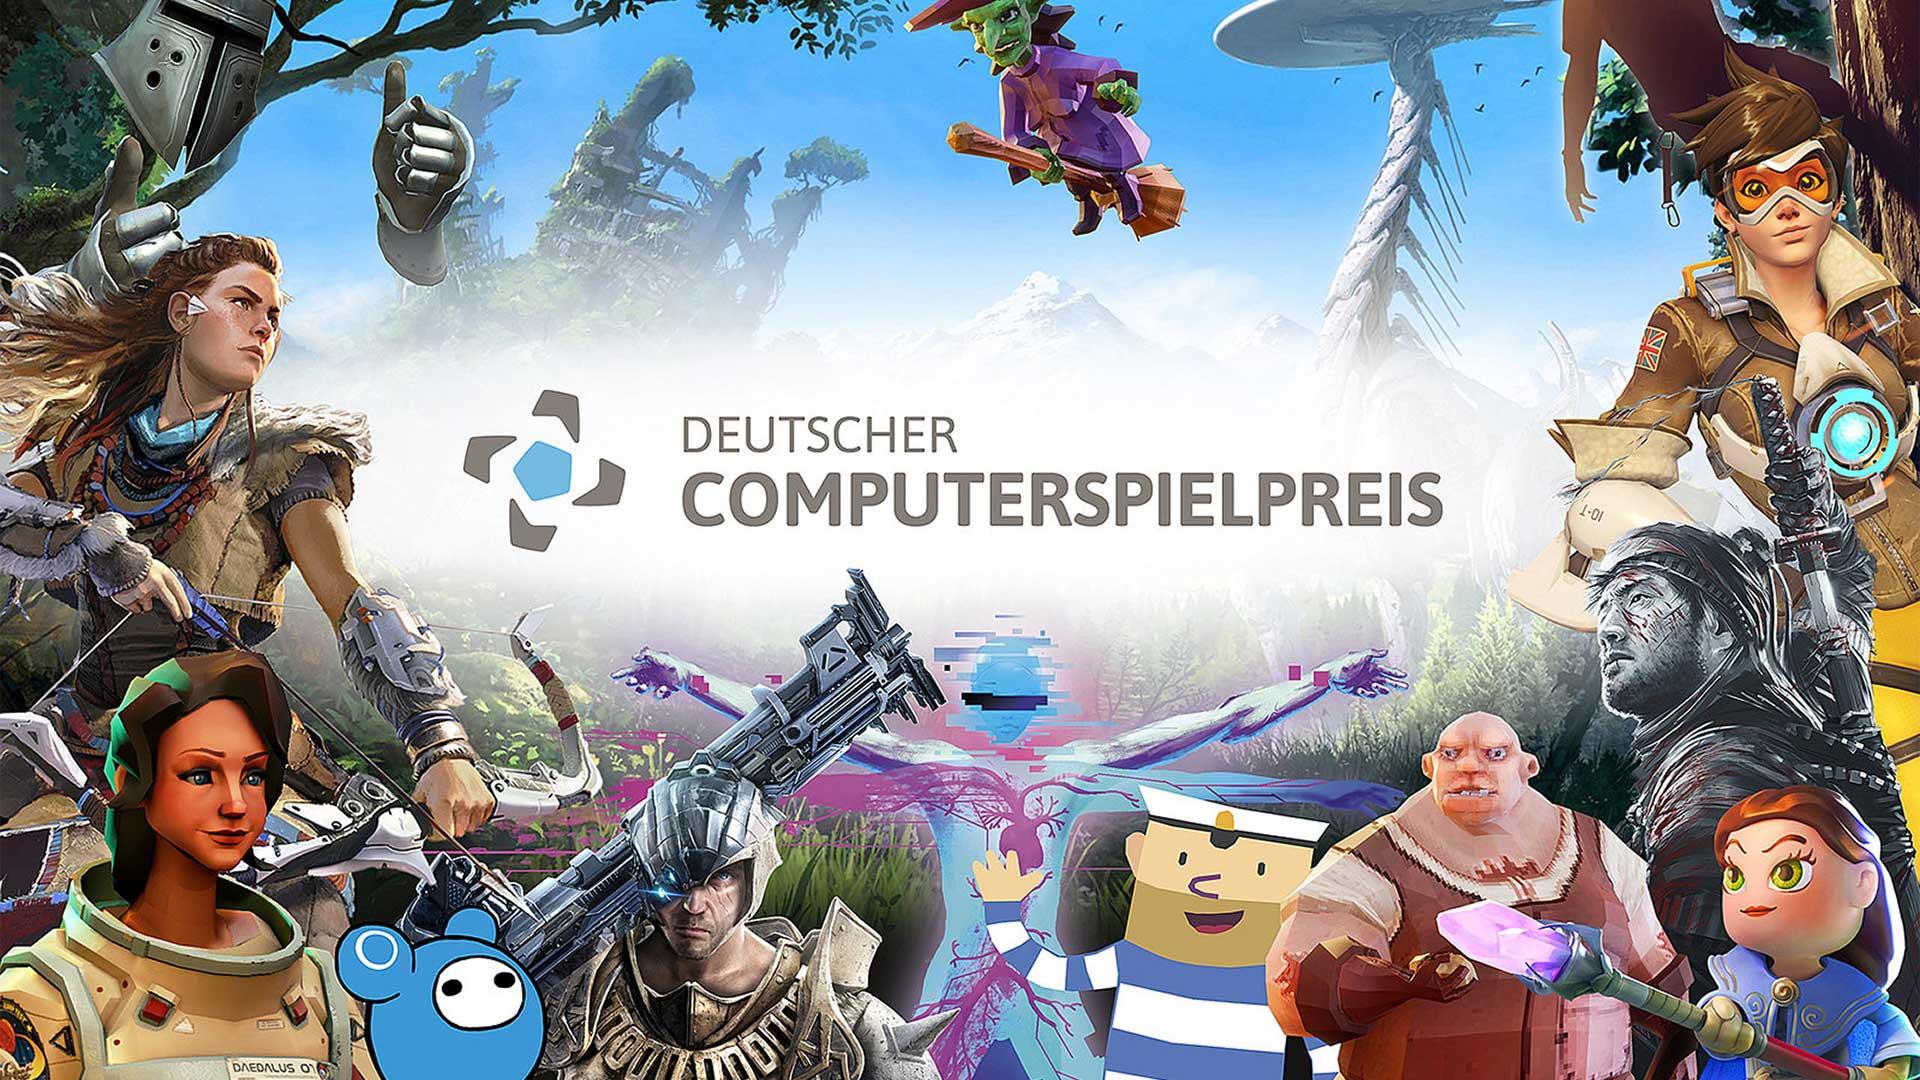 deutscher computerspielpreis dcp